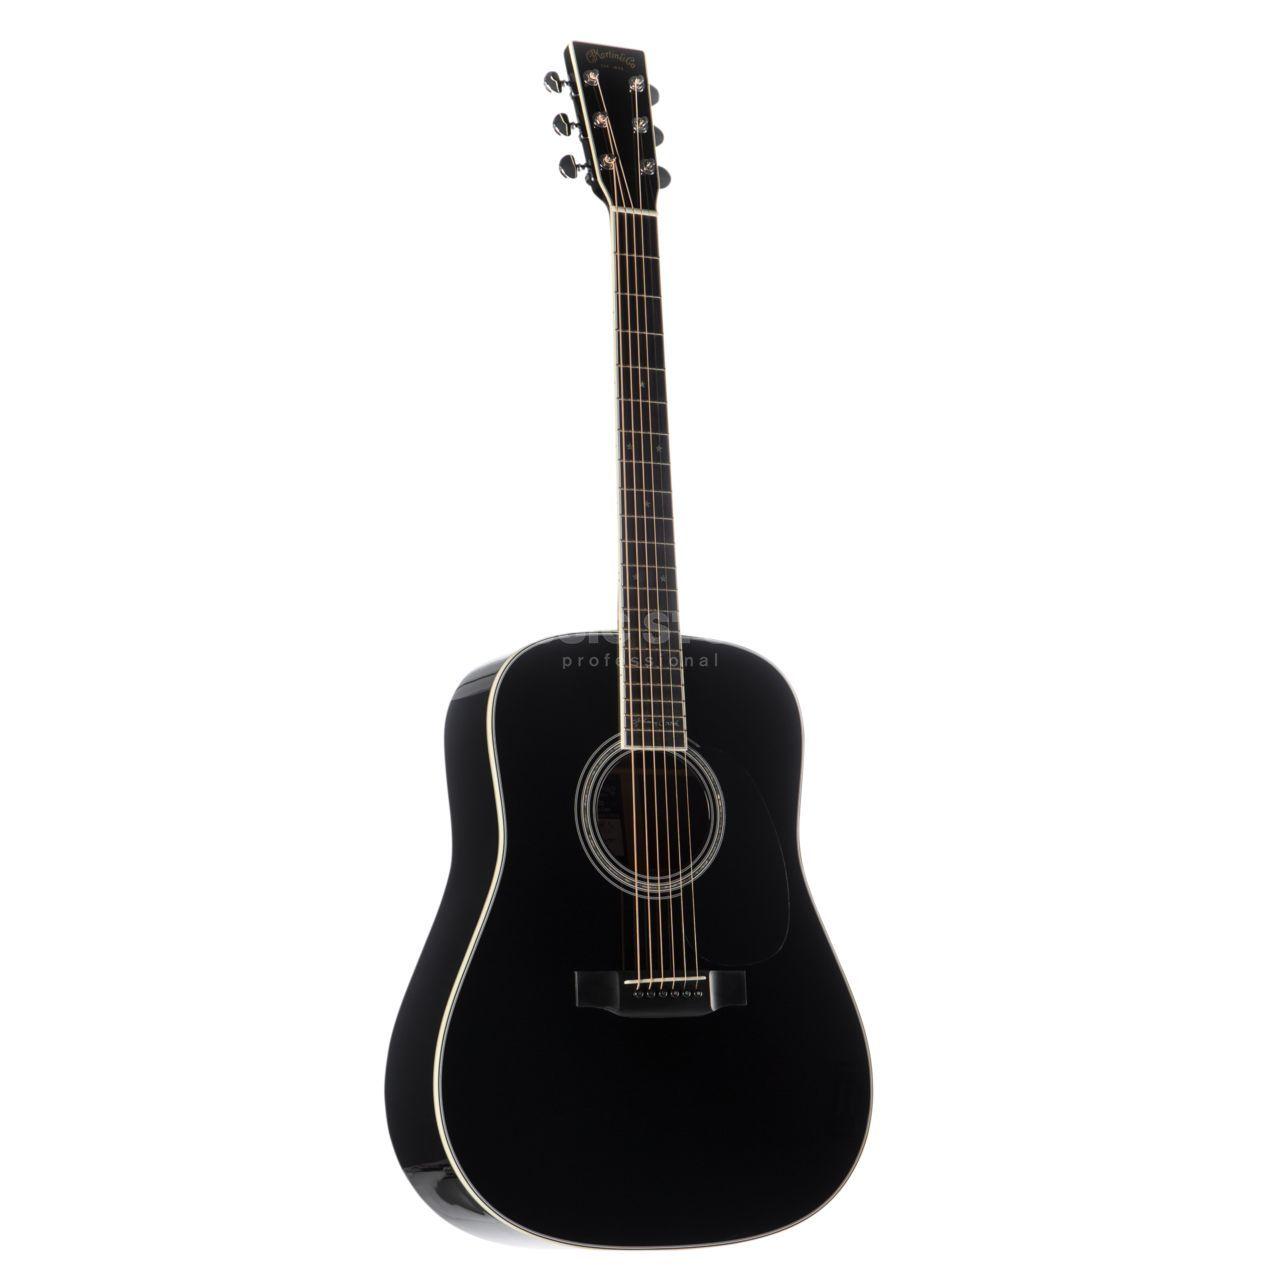 martin guitars d 35 johnny cash music store professional de de. Black Bedroom Furniture Sets. Home Design Ideas